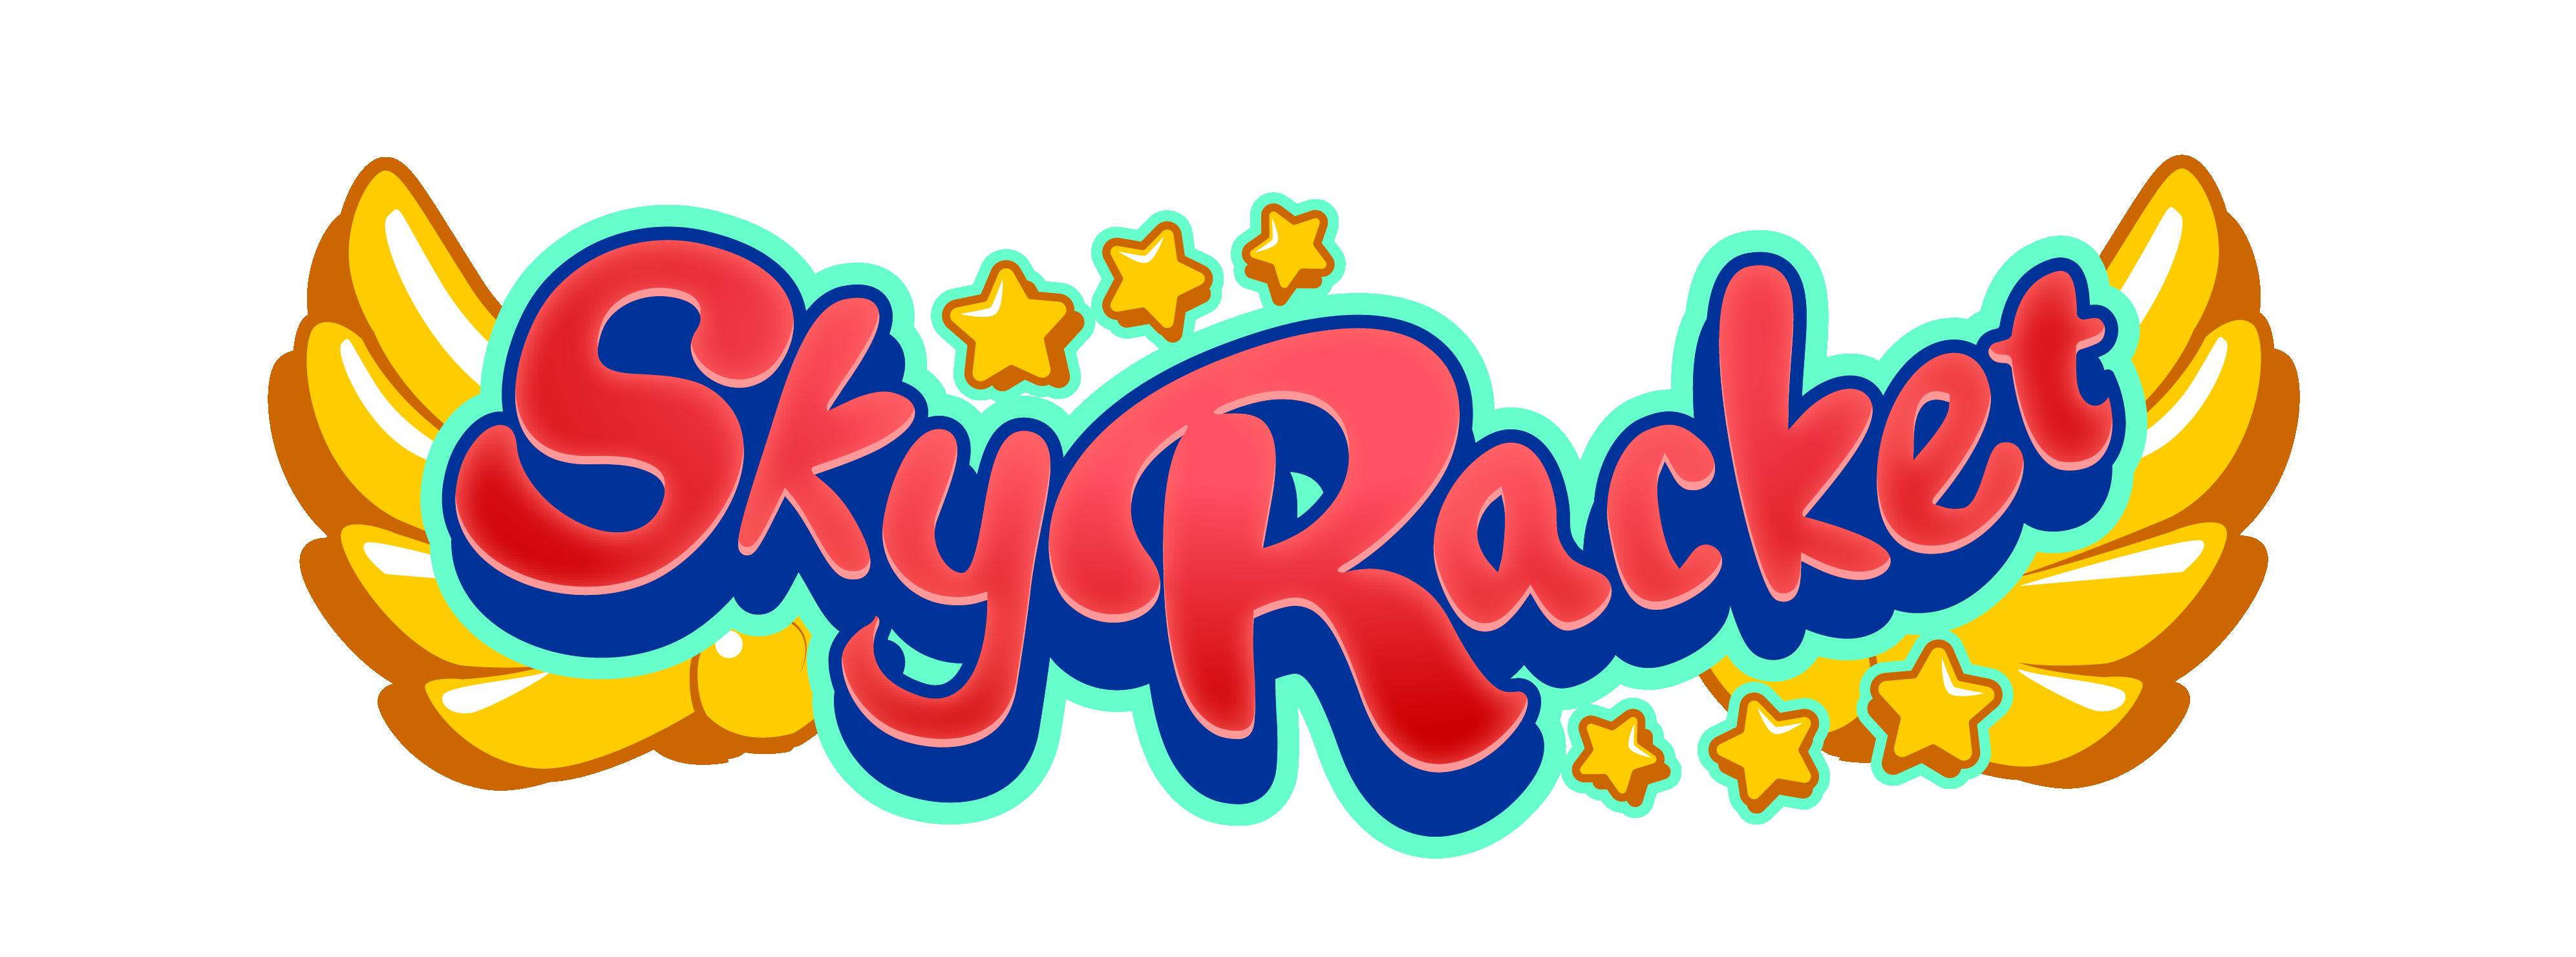 Sky Racket Official Soundtrack